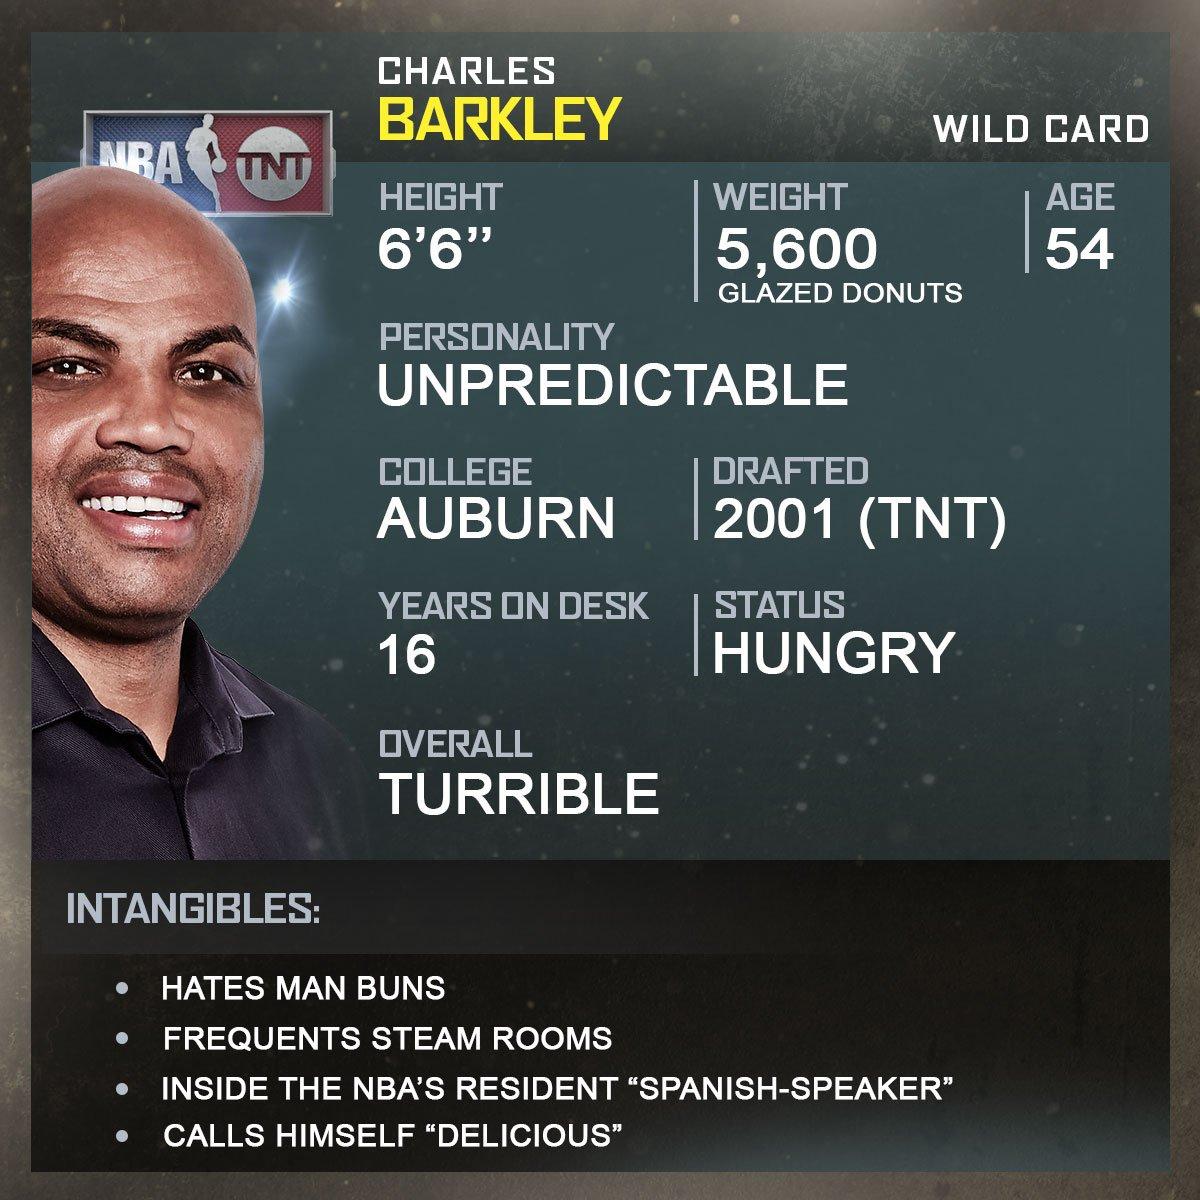 #InsidetheNBA's #NBA2K ratings revealed! 😂